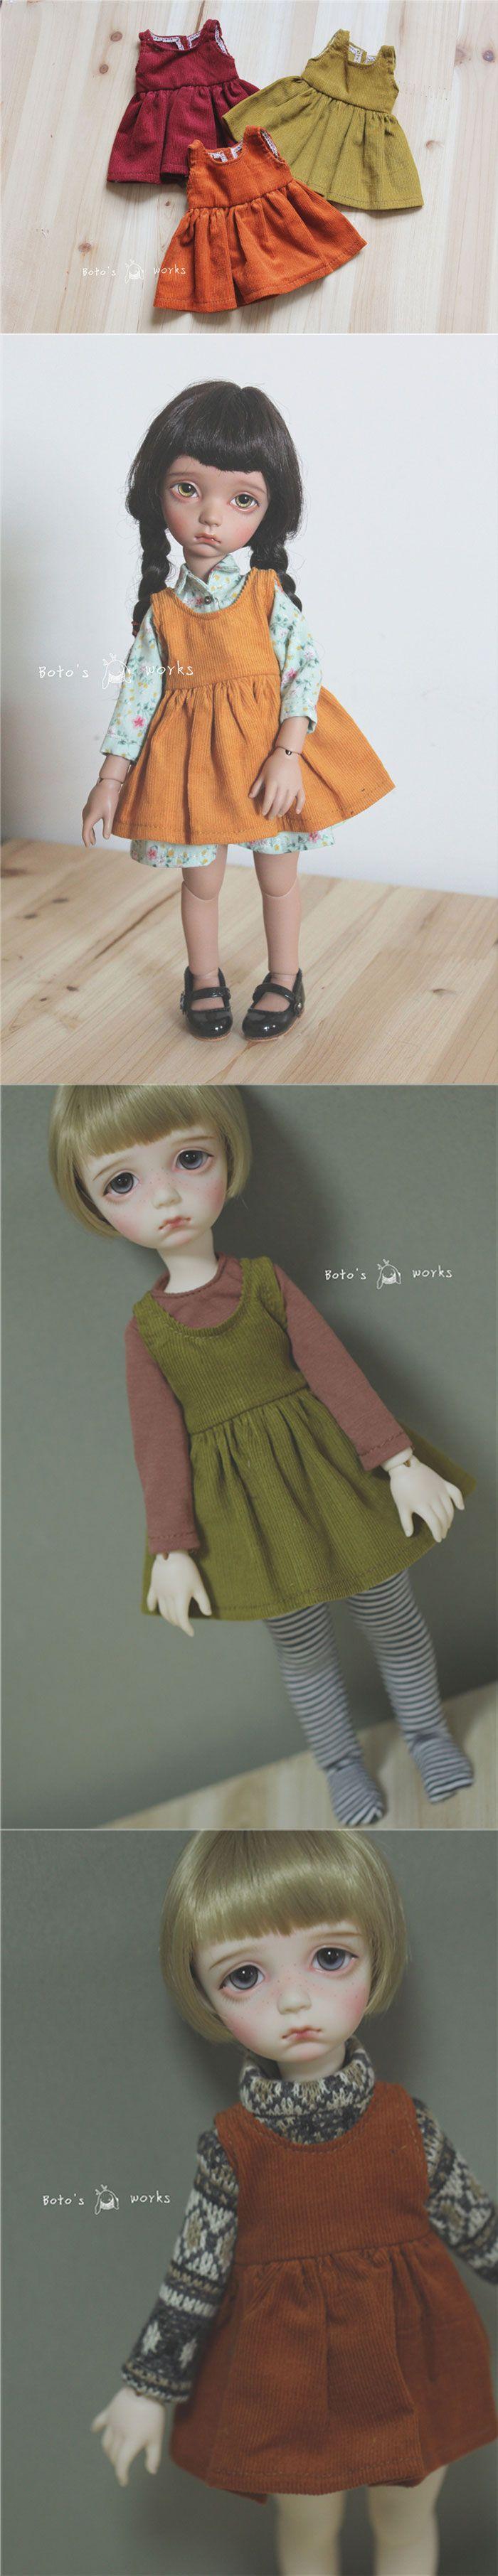 BJD Clothes 1/6 1/4 Girl Sundress for MSD/YSD Ball-jointed Doll_CLOTHING_Ball Jointed Dolls (BJD) company-Legenddoll